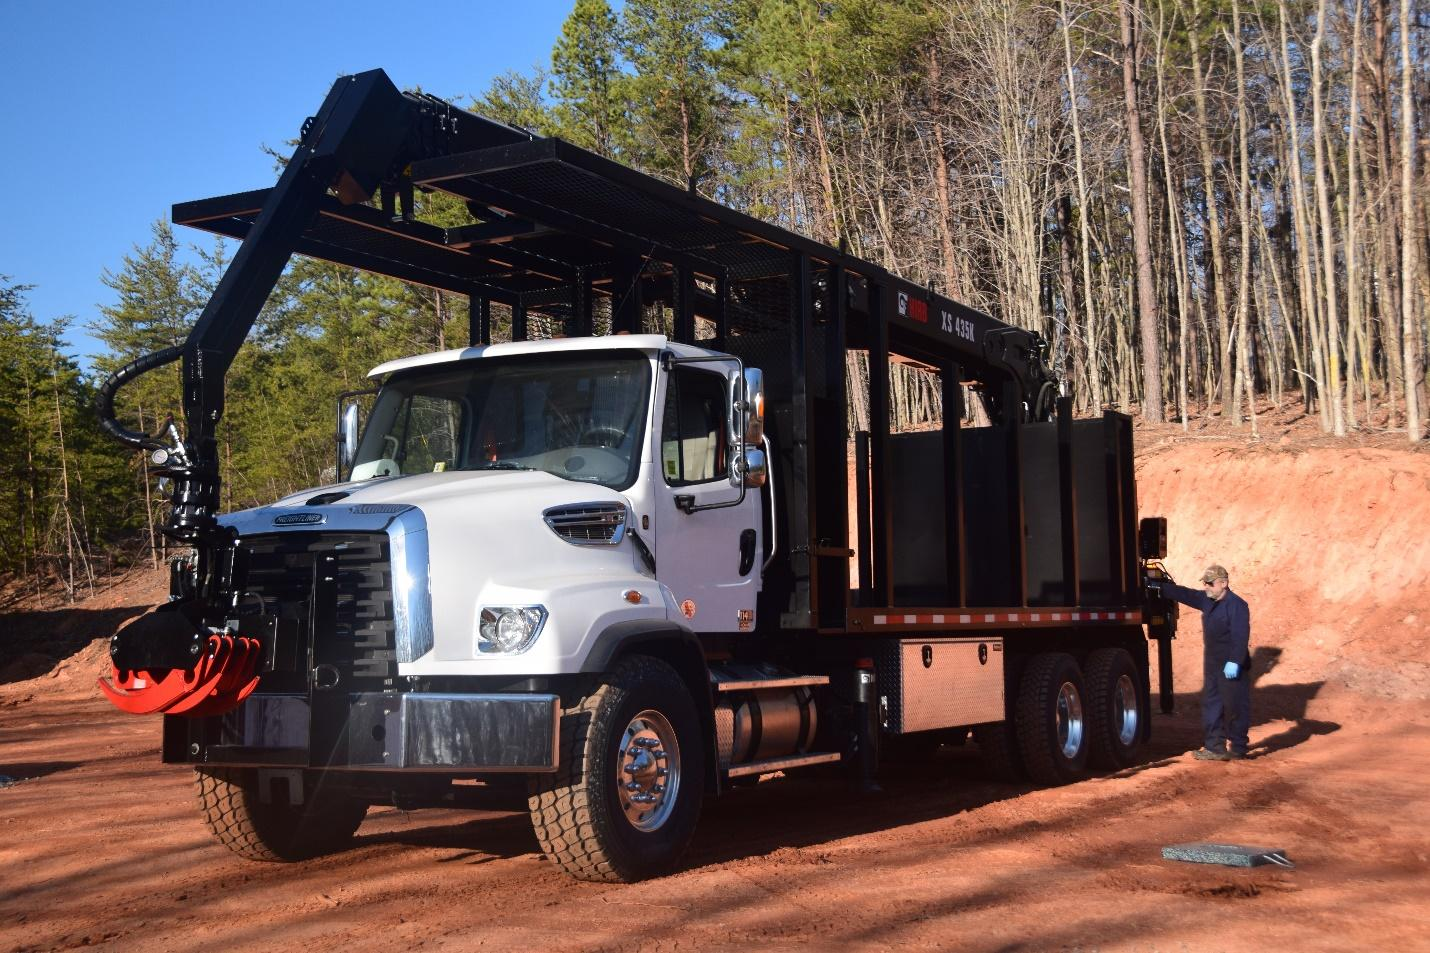 Timberland Trucks A Small Business That Makes Big Trucks